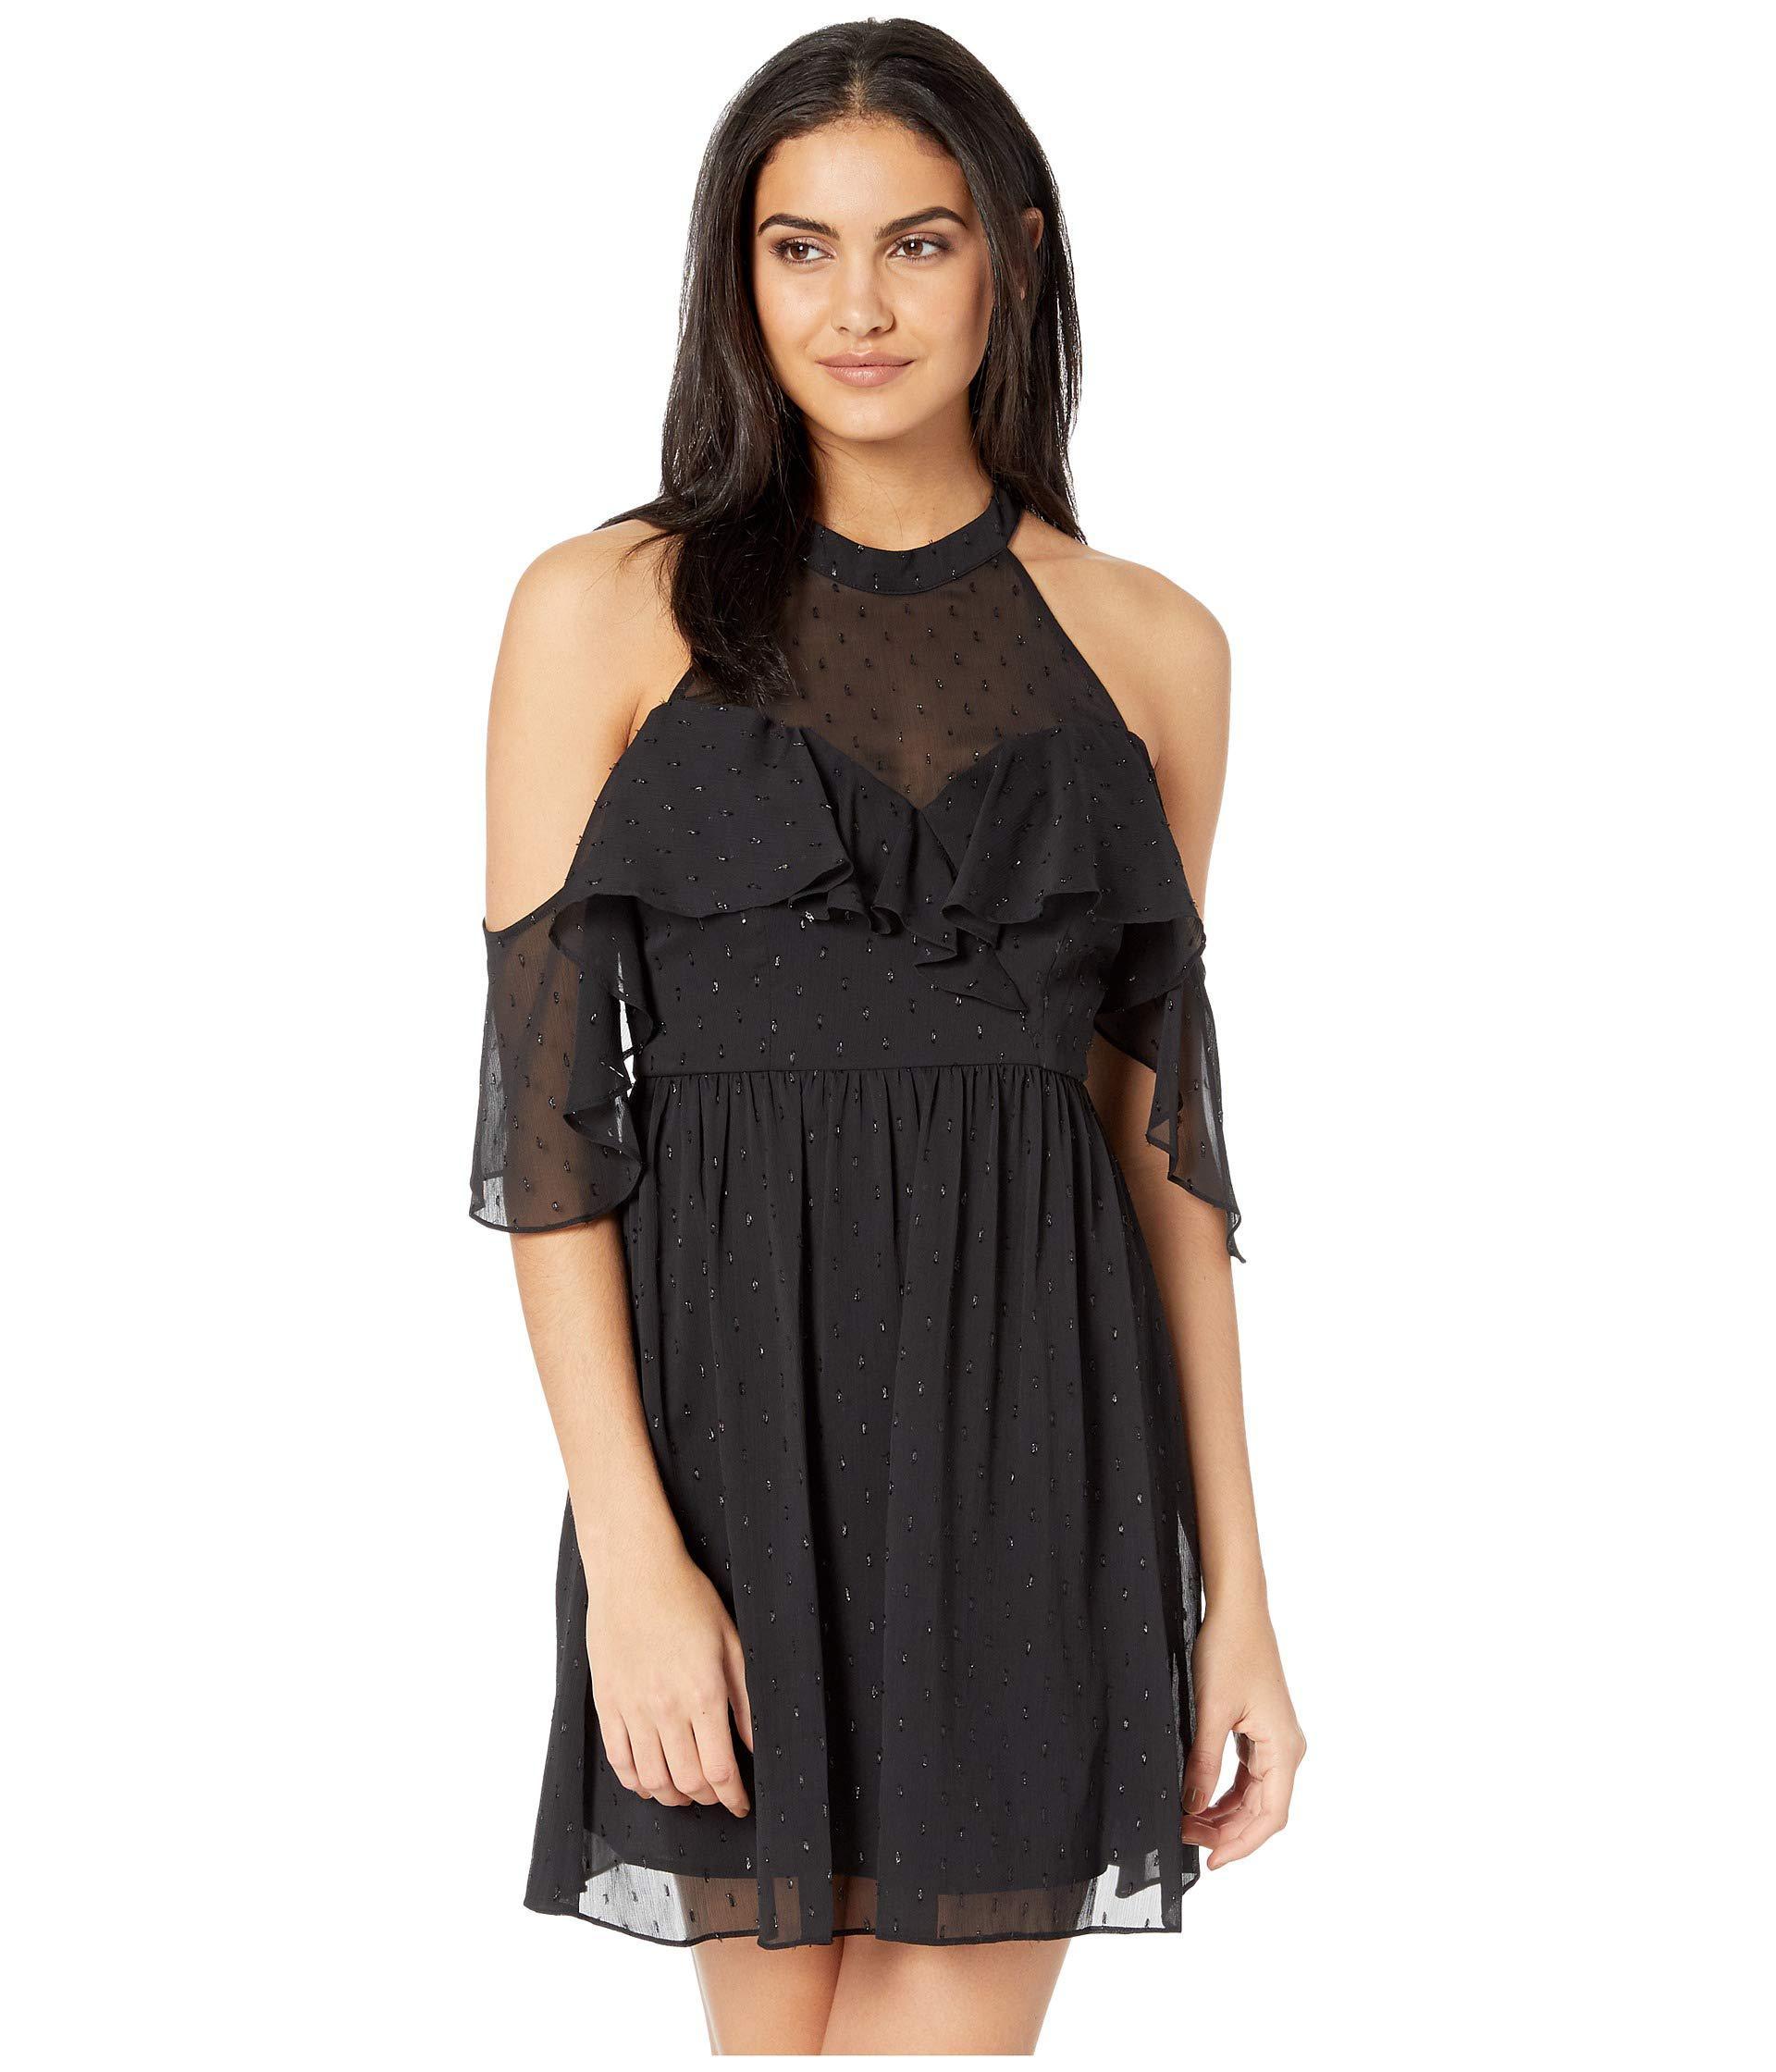 3e9718f49f8 Lyst - BCBGeneration Halter Cold Shoulder Ruffle Dress in Black